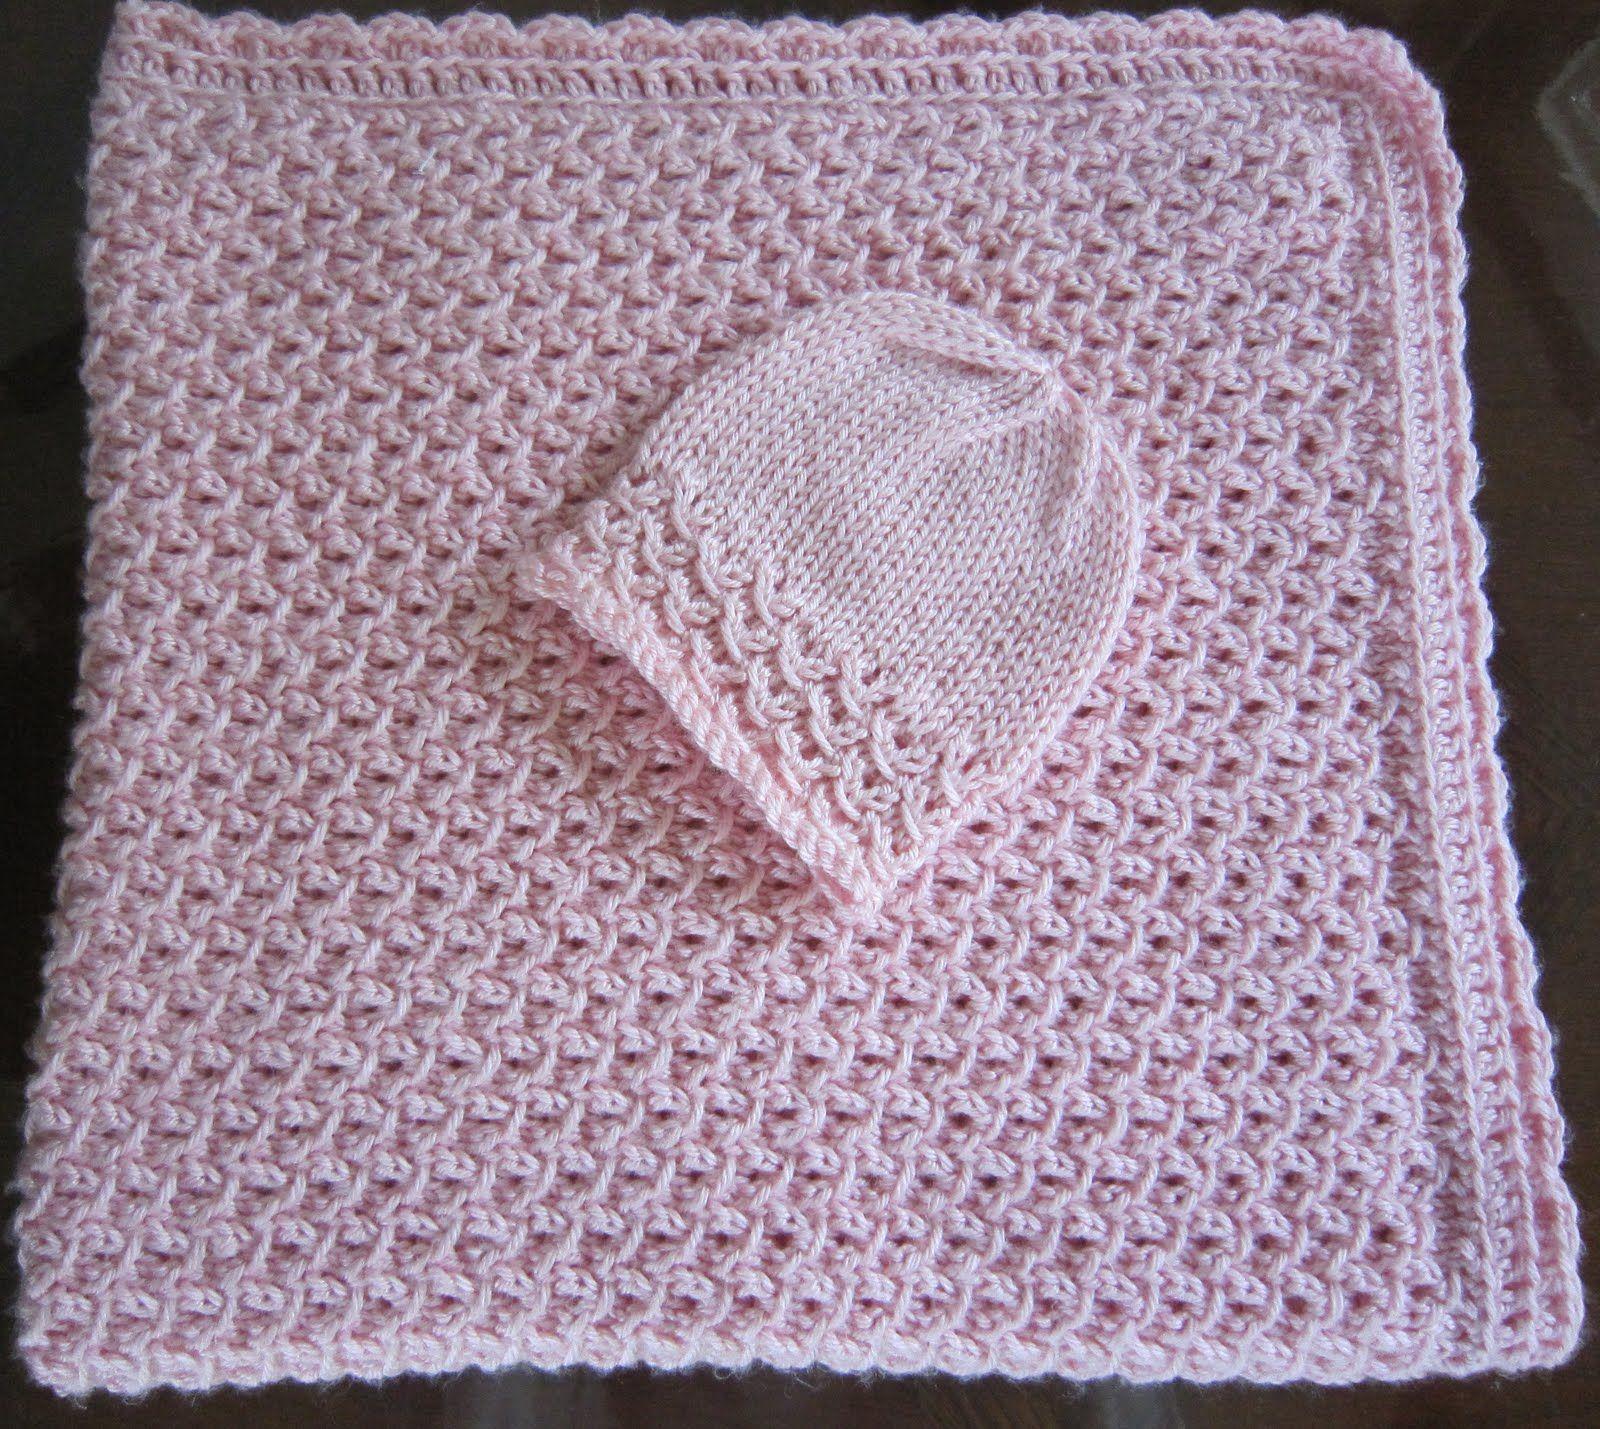 Free crochet patterns baby blankets grandmas free knit pattern free crochet patterns baby blankets grandmas free knit pattern preemie hat and blanket waves bankloansurffo Images